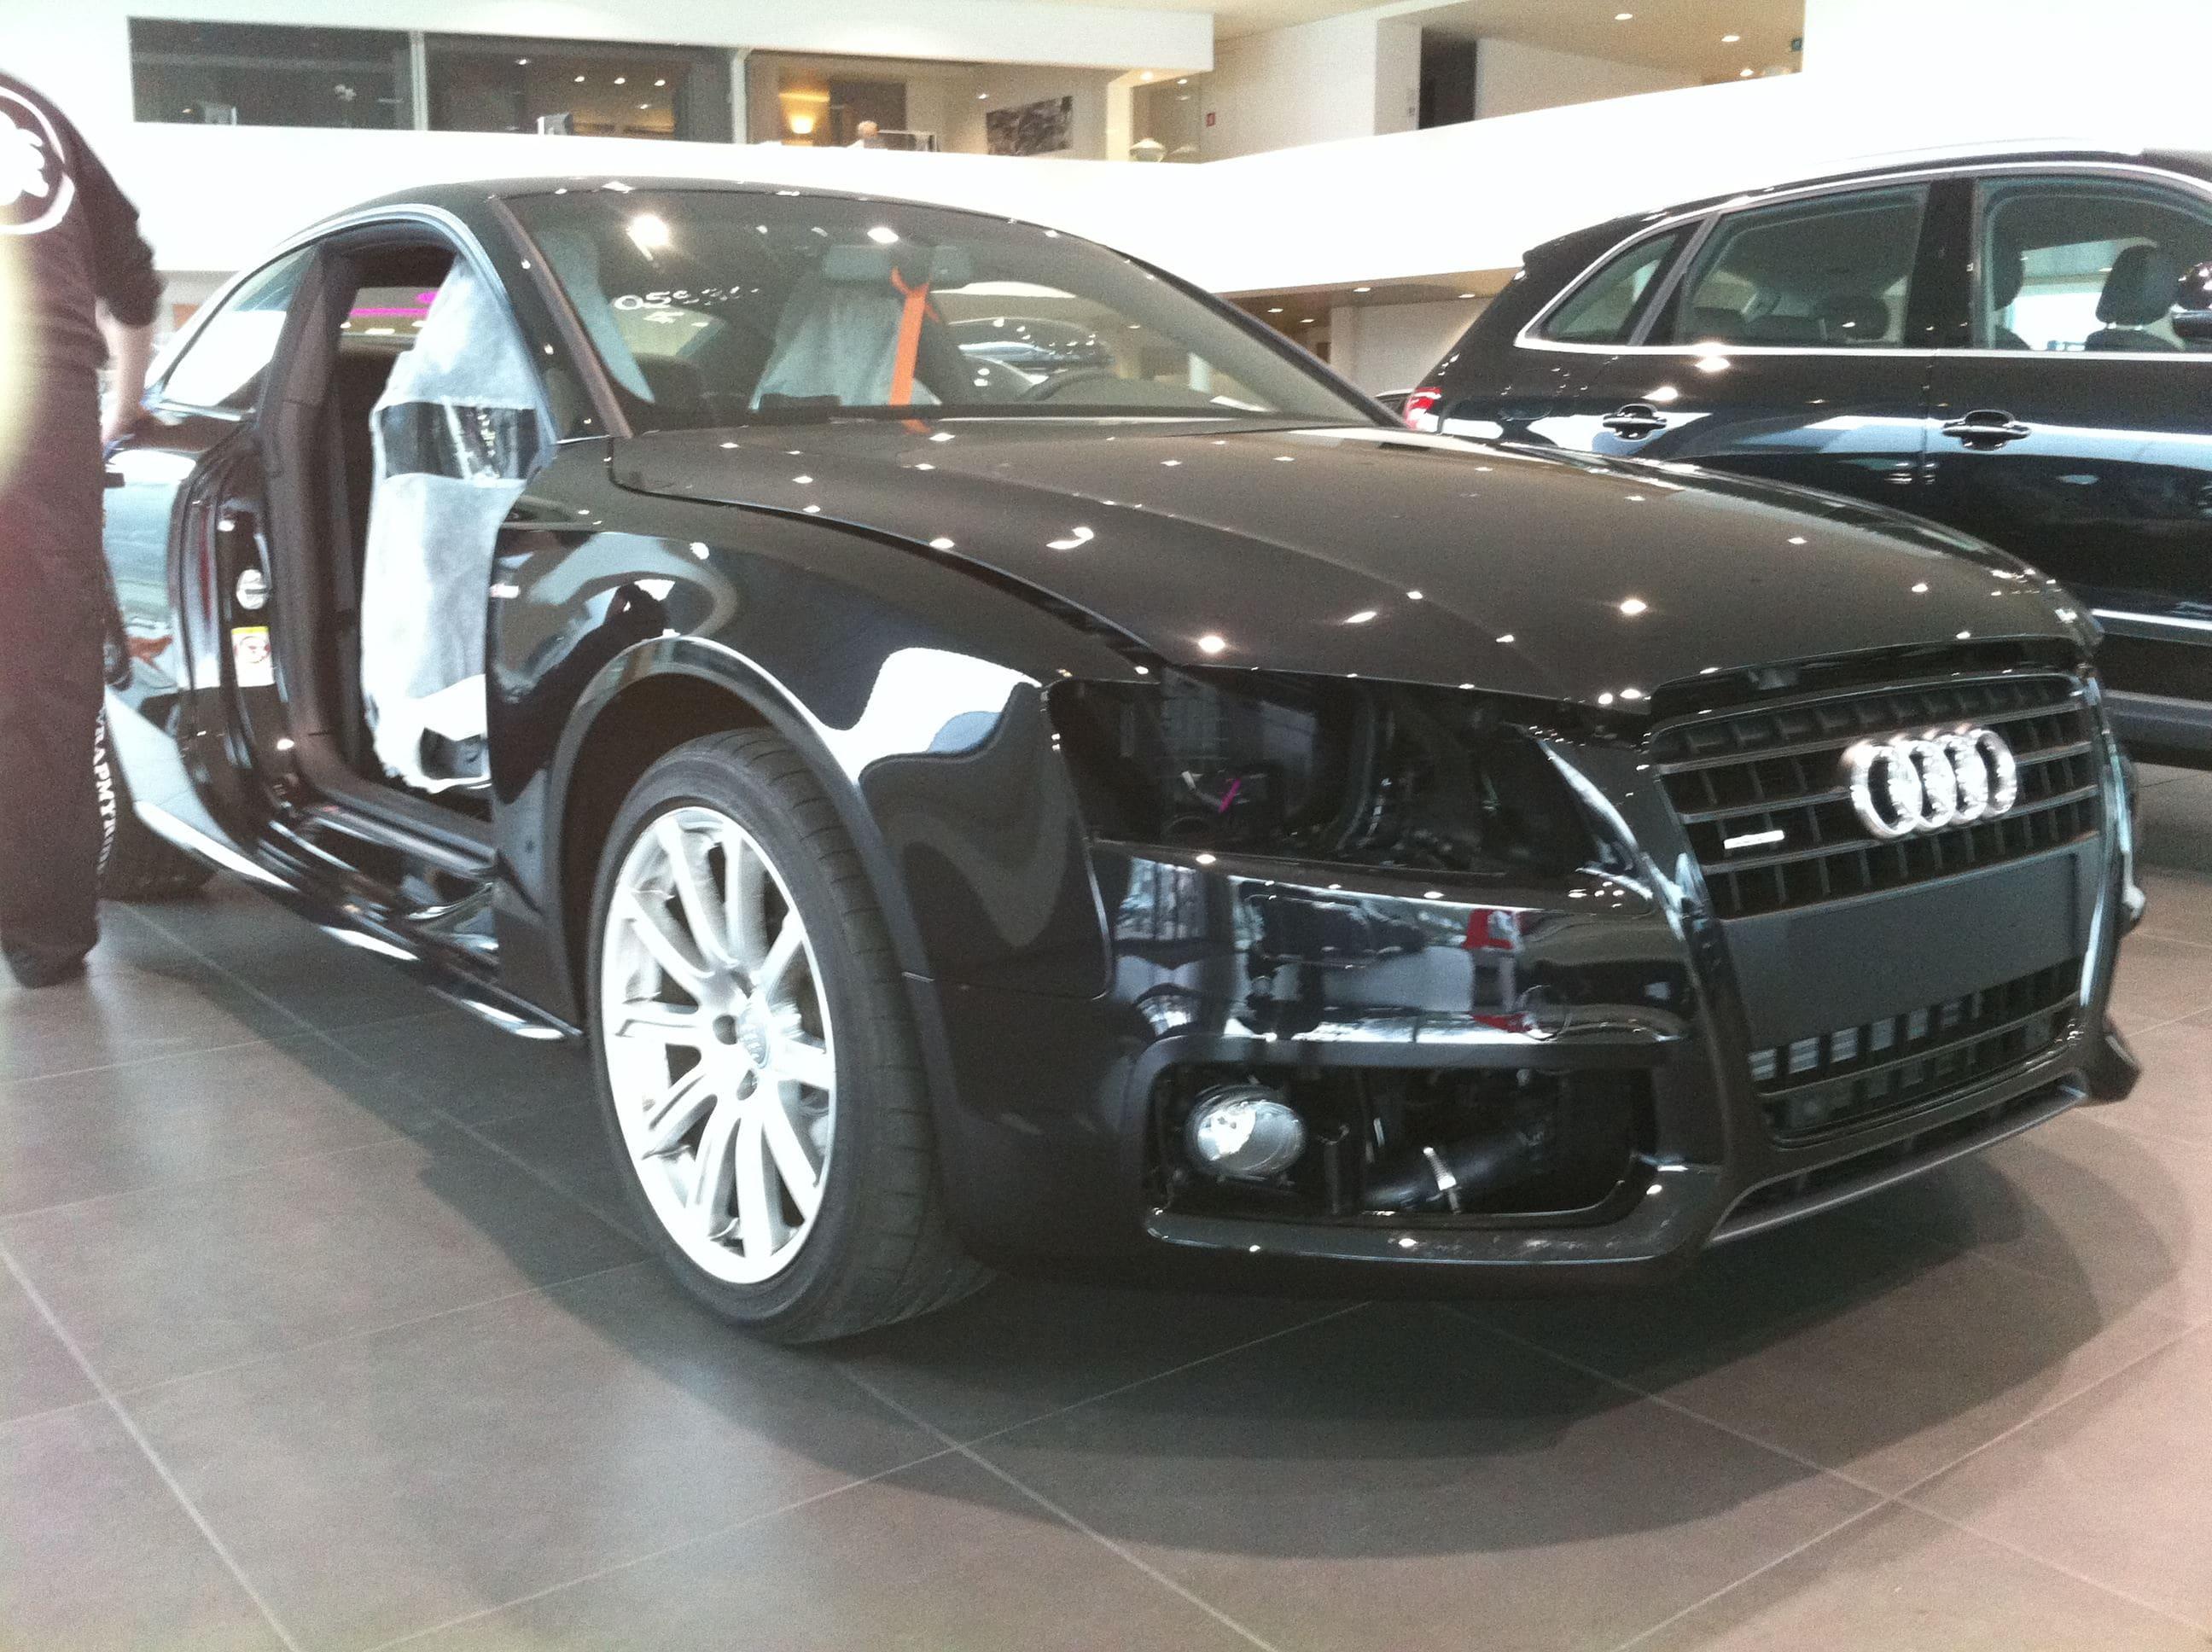 Audi A5 Coupe met Mat Zwarte Wrap, Carwrapping door Wrapmyride.nu Foto-nr:4570, ©2021